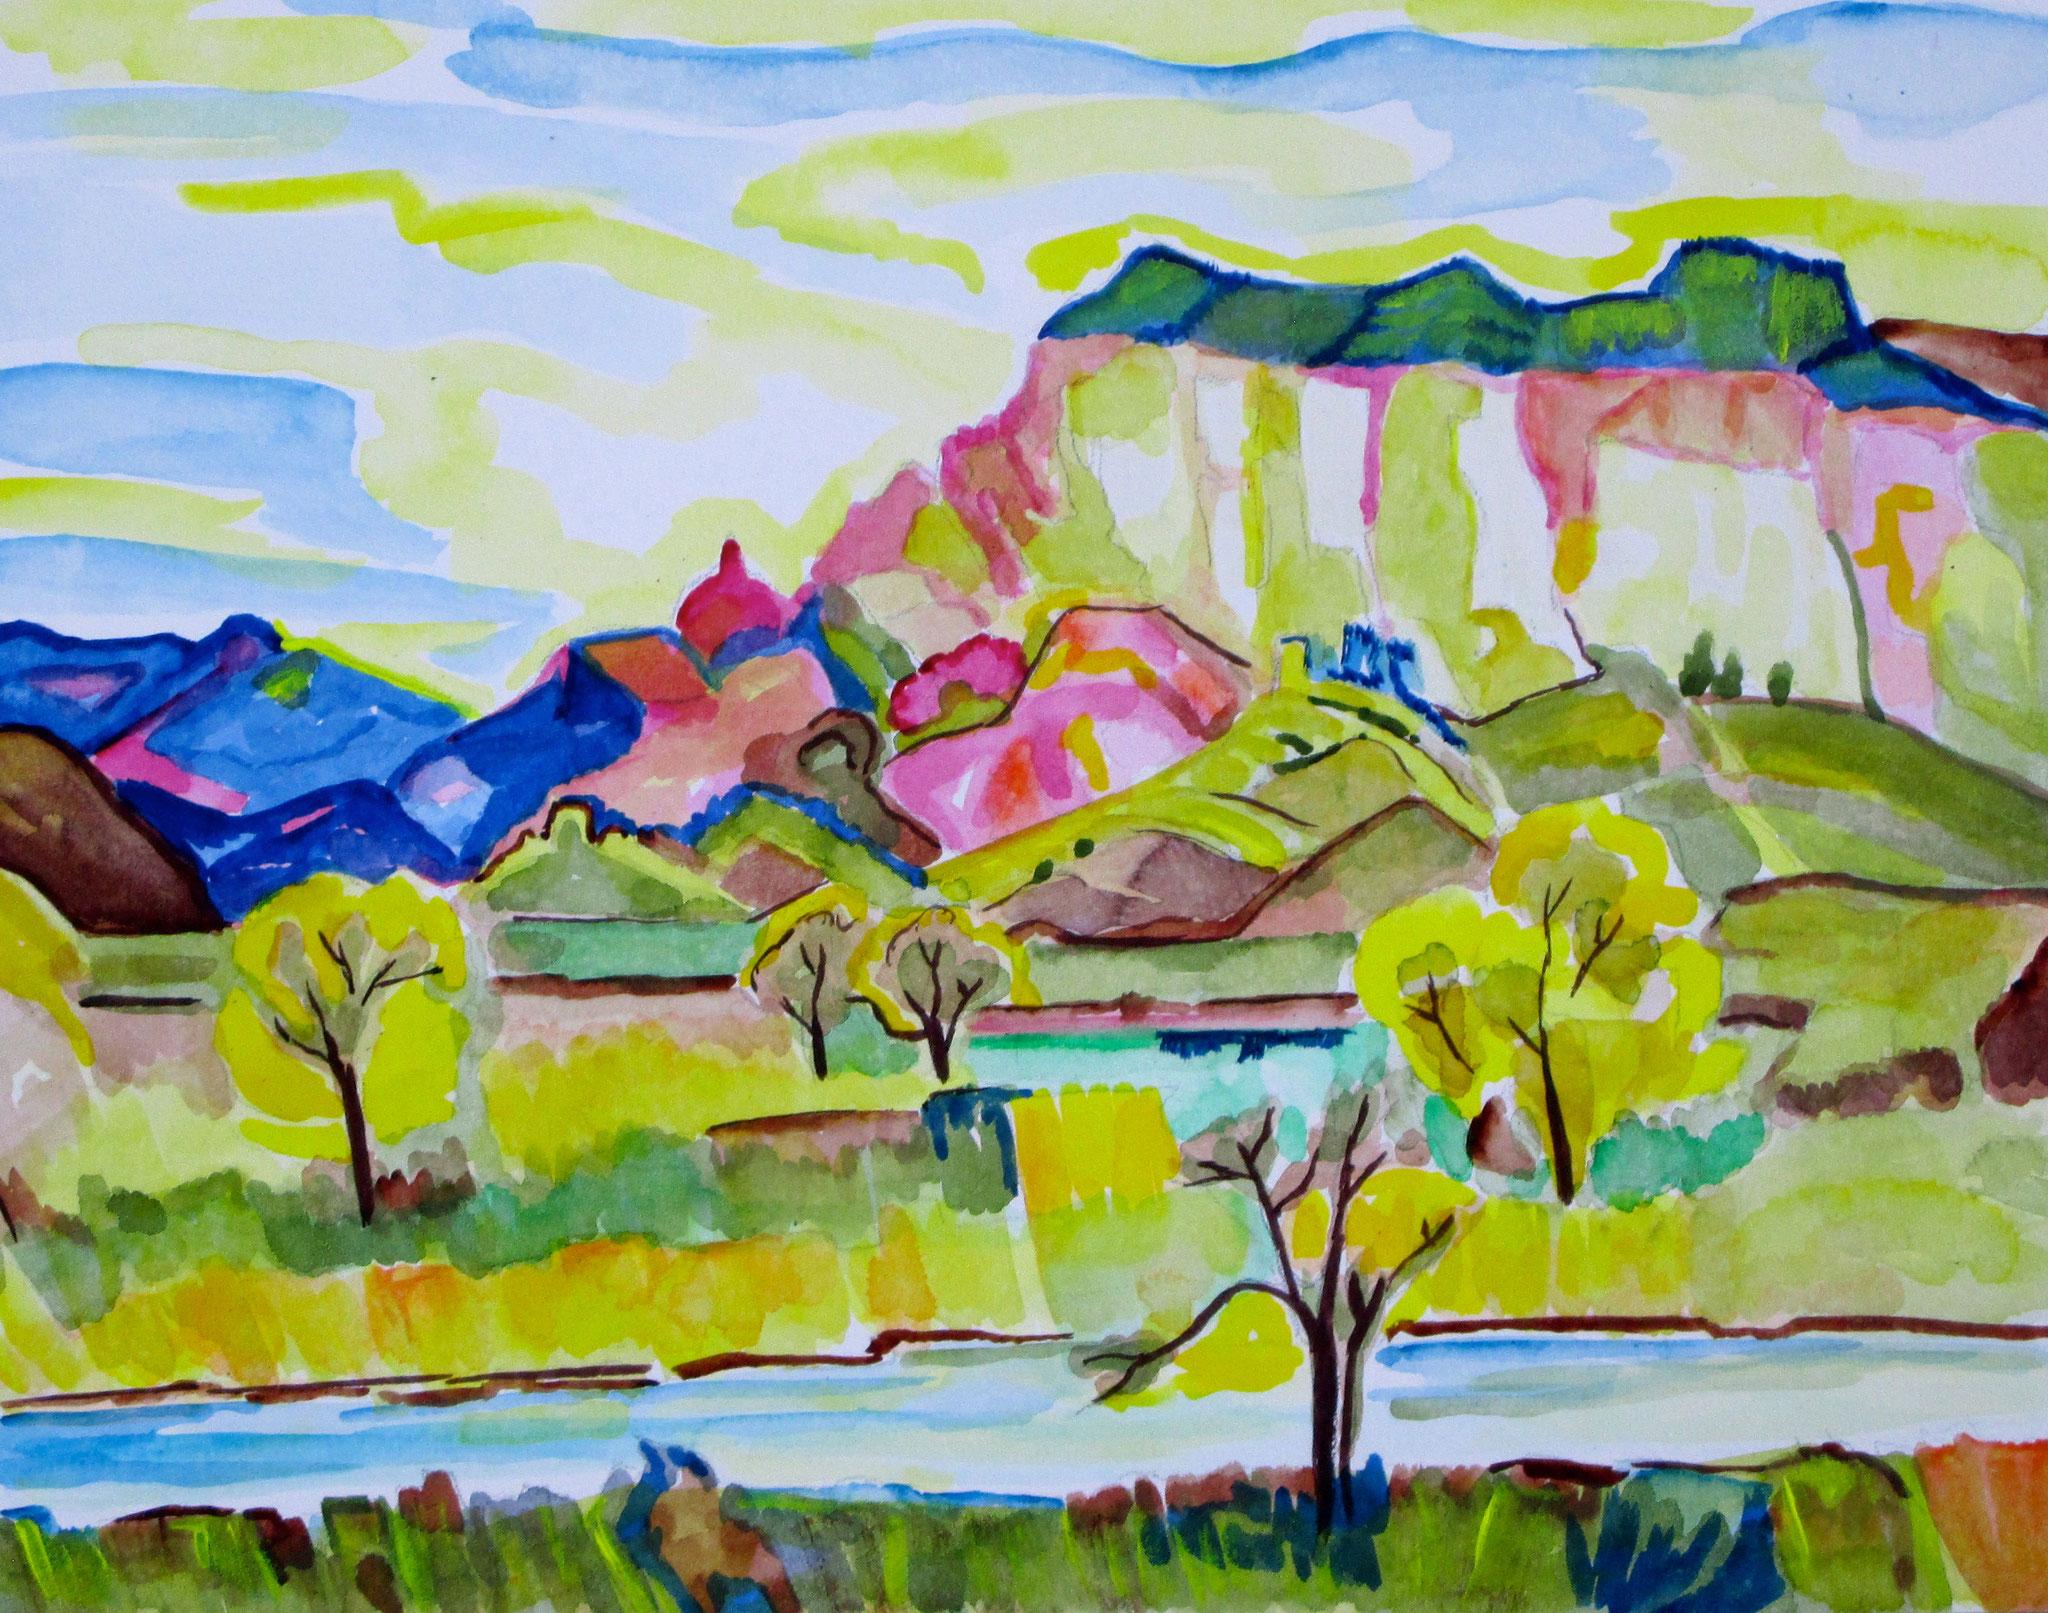 Spring Splendor, watercolor on board, 14 x 11, 2016